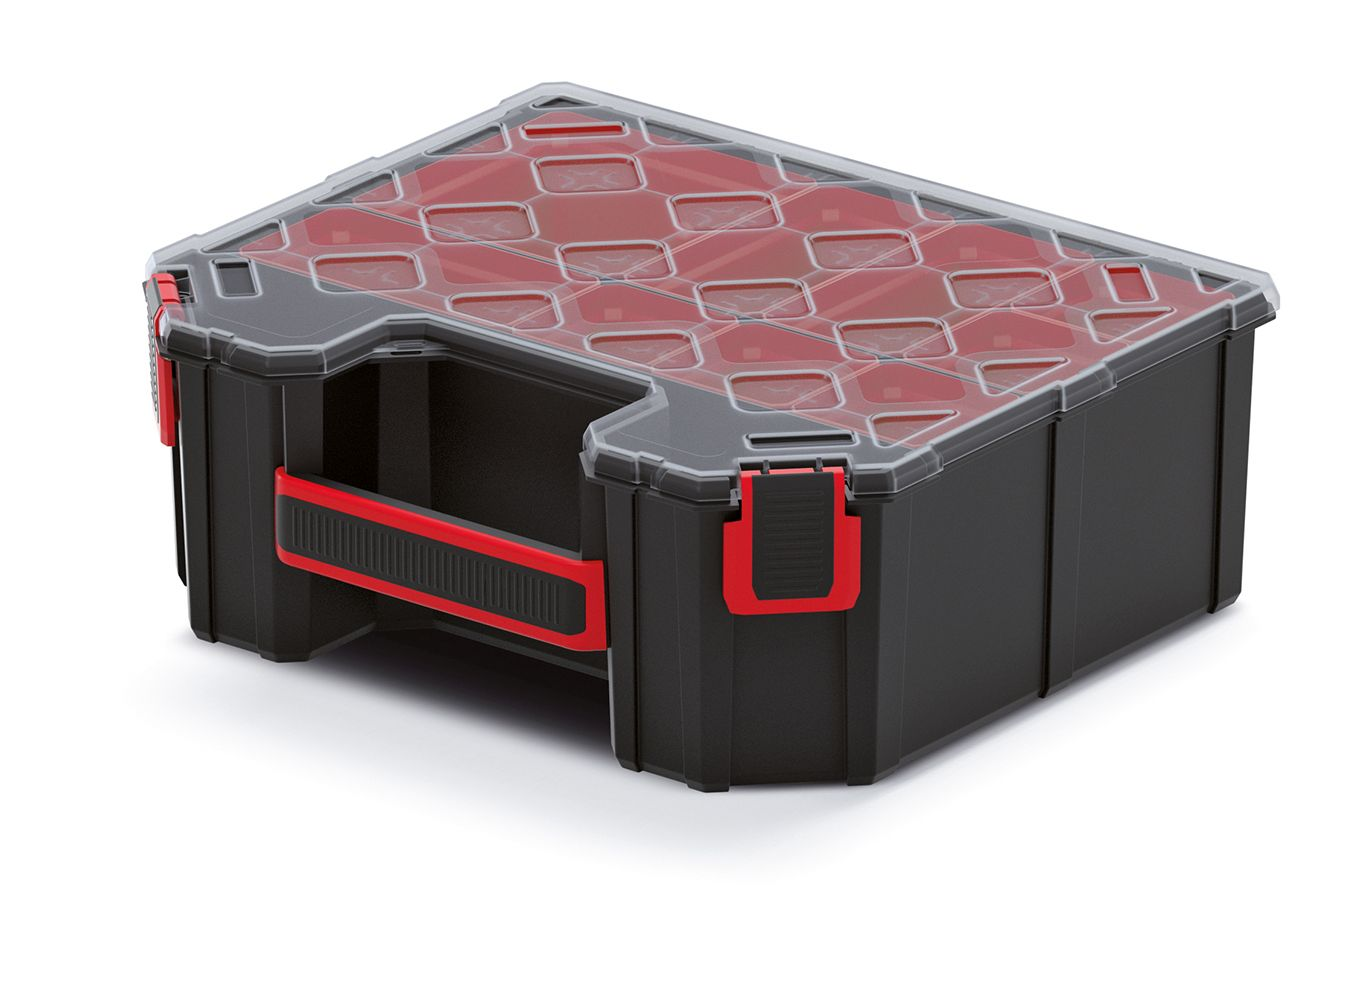 PROSPERPLAST Organizér vysoký TAGER 284x243x105 (krabičky)